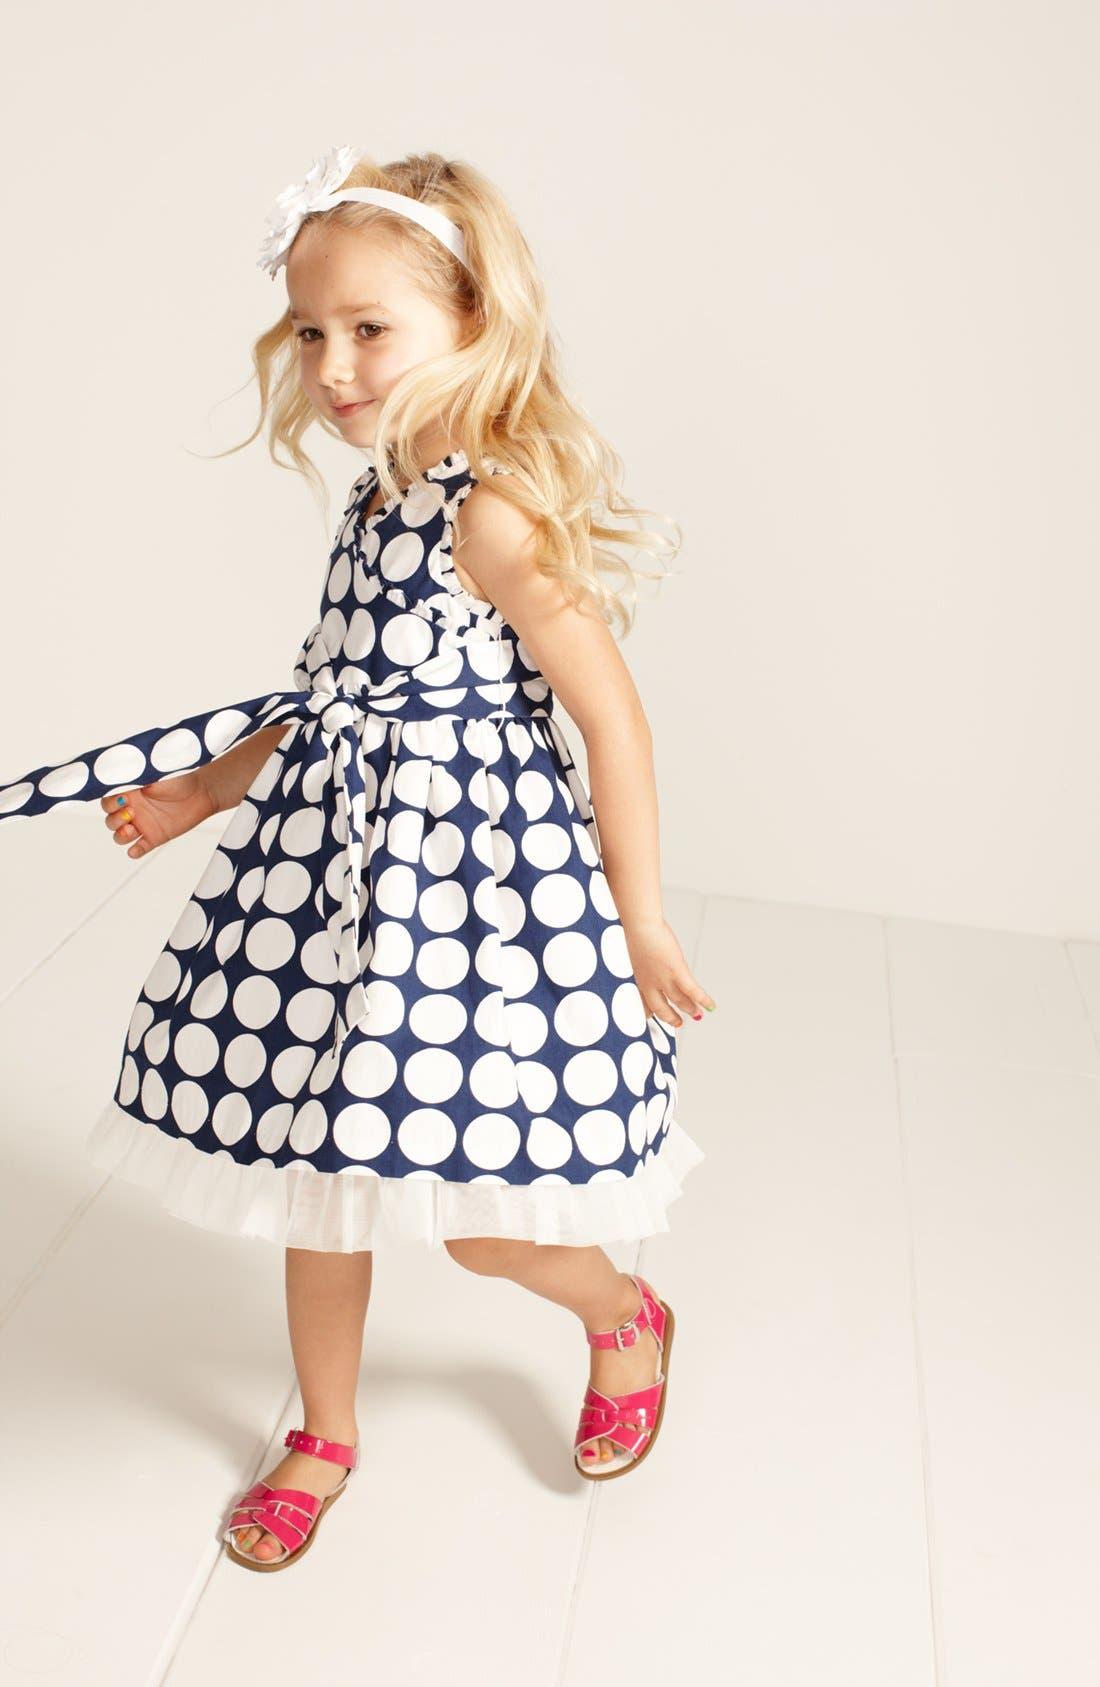 Main Image - Marmelatta Dress & Hoy Shoe Salt-Water® Sandal (Toddler Girls, Little Girls & Big Girls)